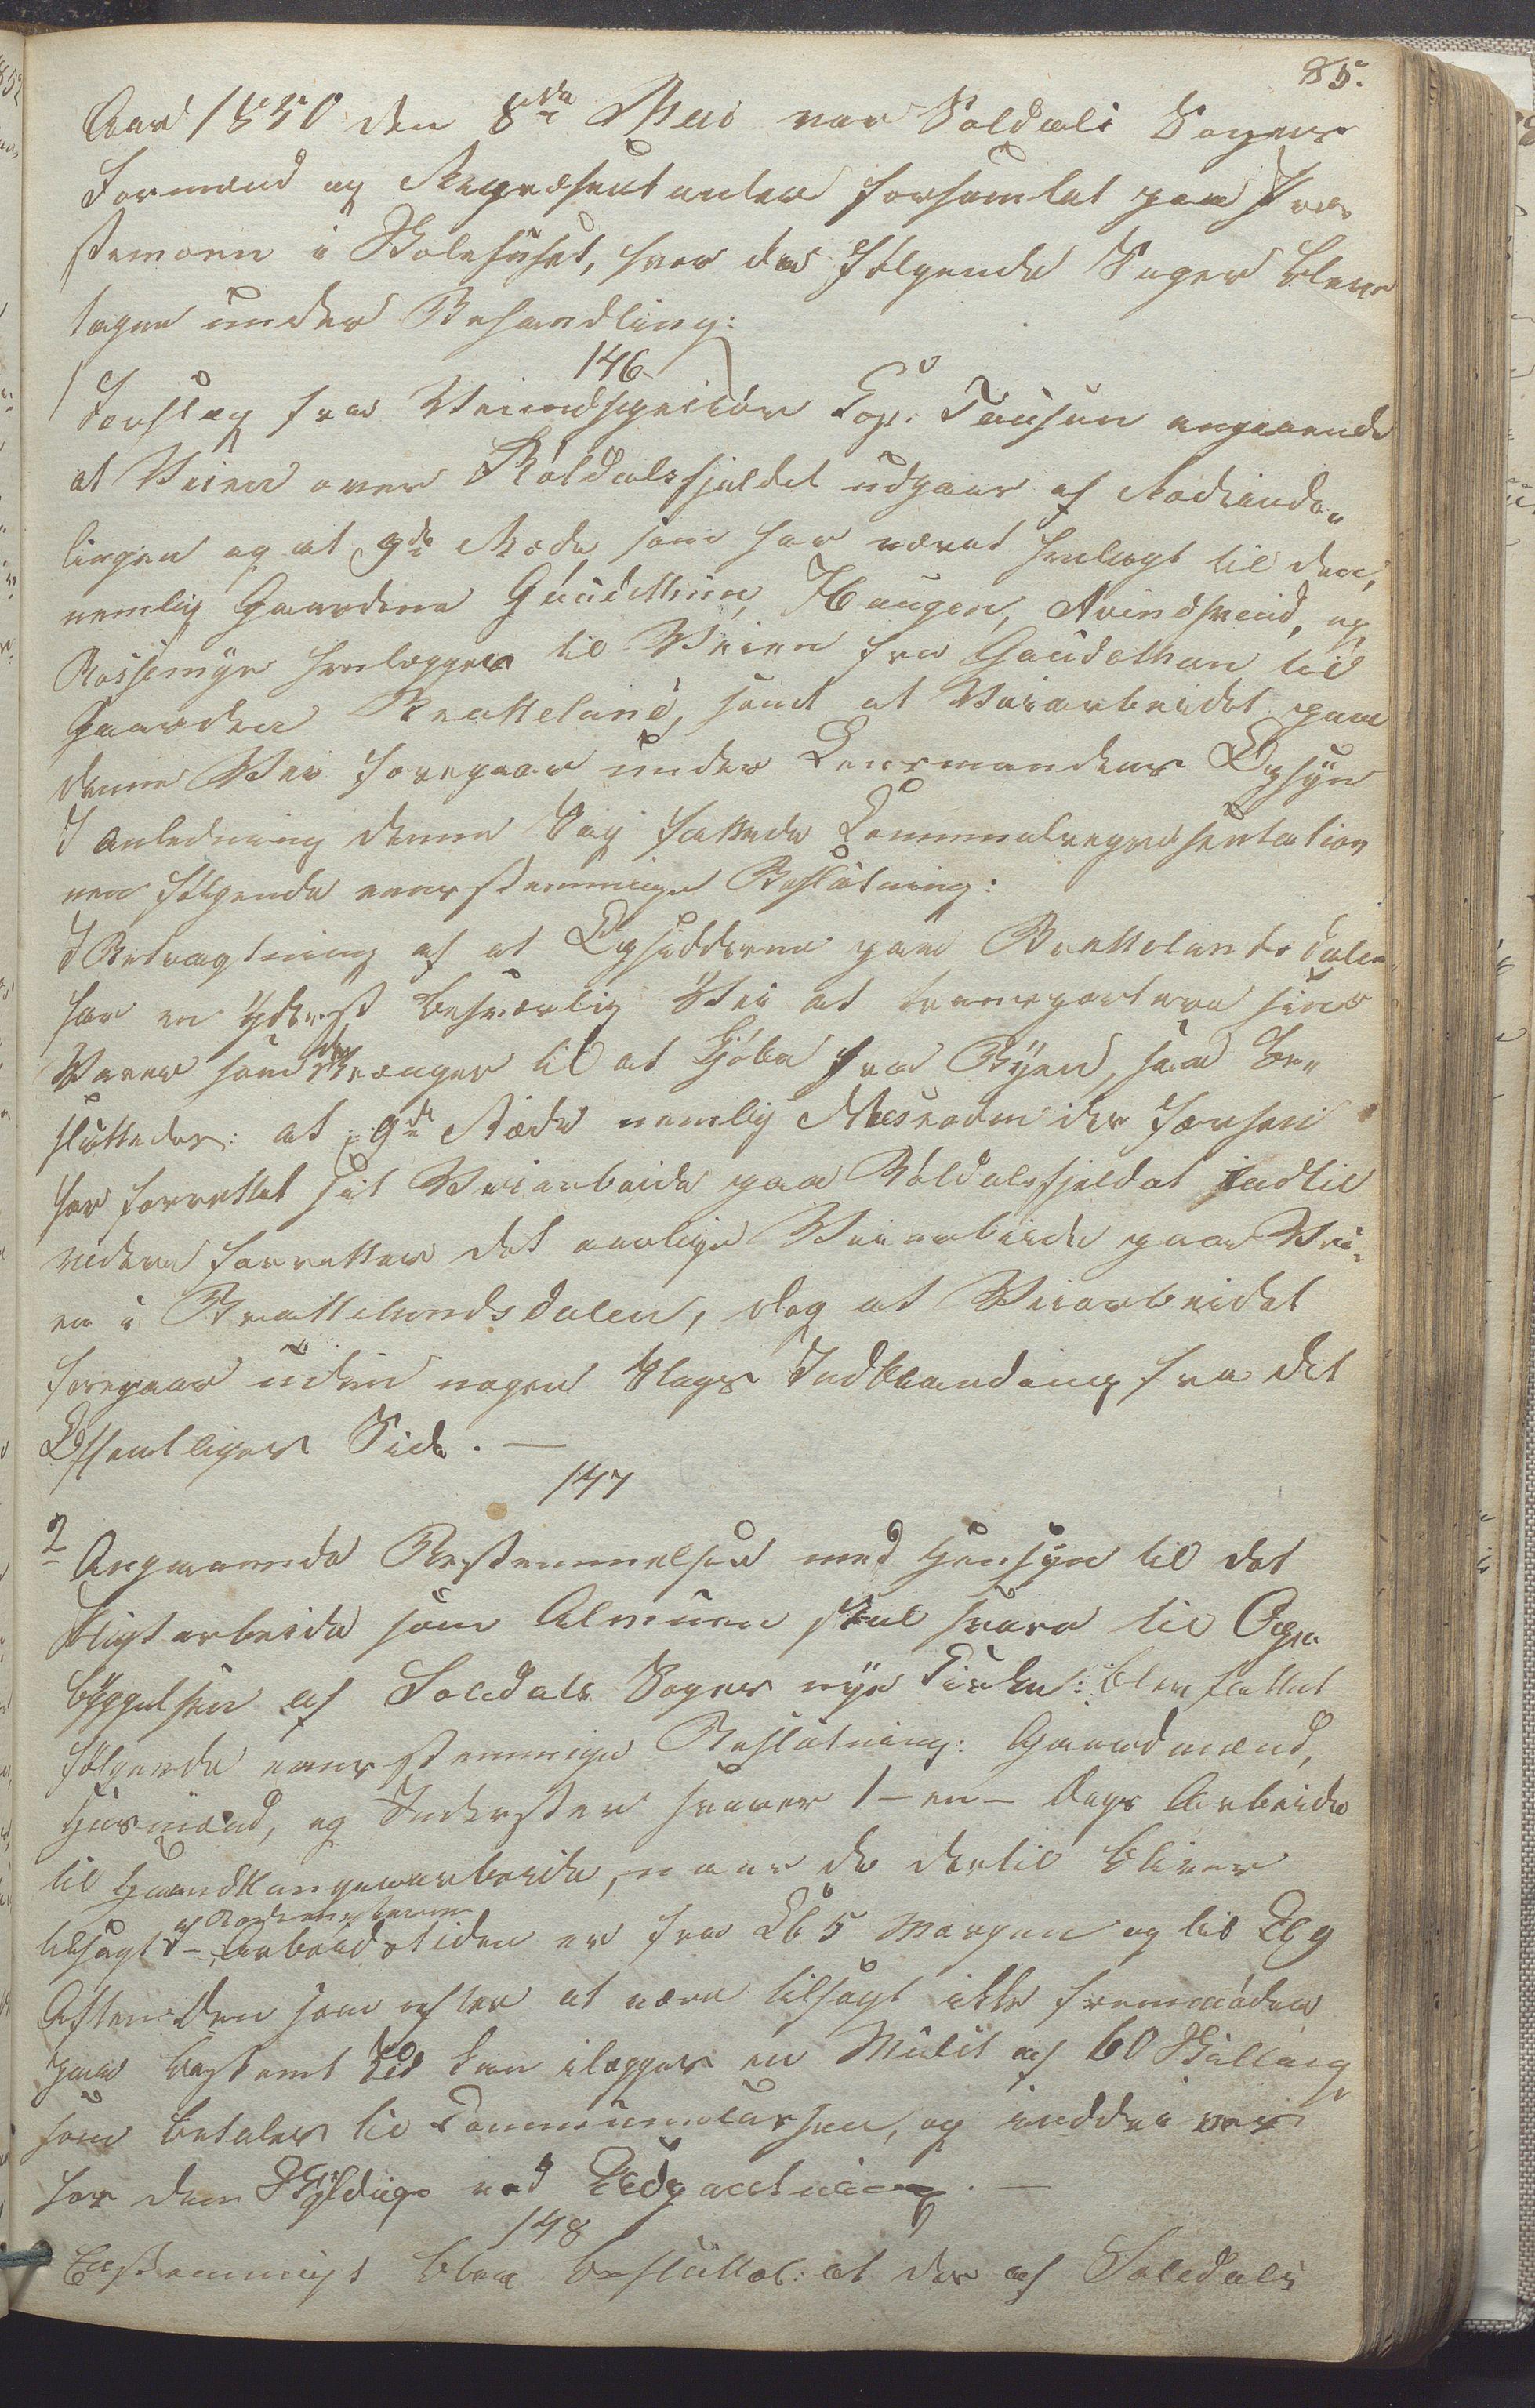 IKAR, Suldal kommune - Formannskapet/Rådmannen, A/Aa/L0001: Møtebok, 1837-1876, s. 85a